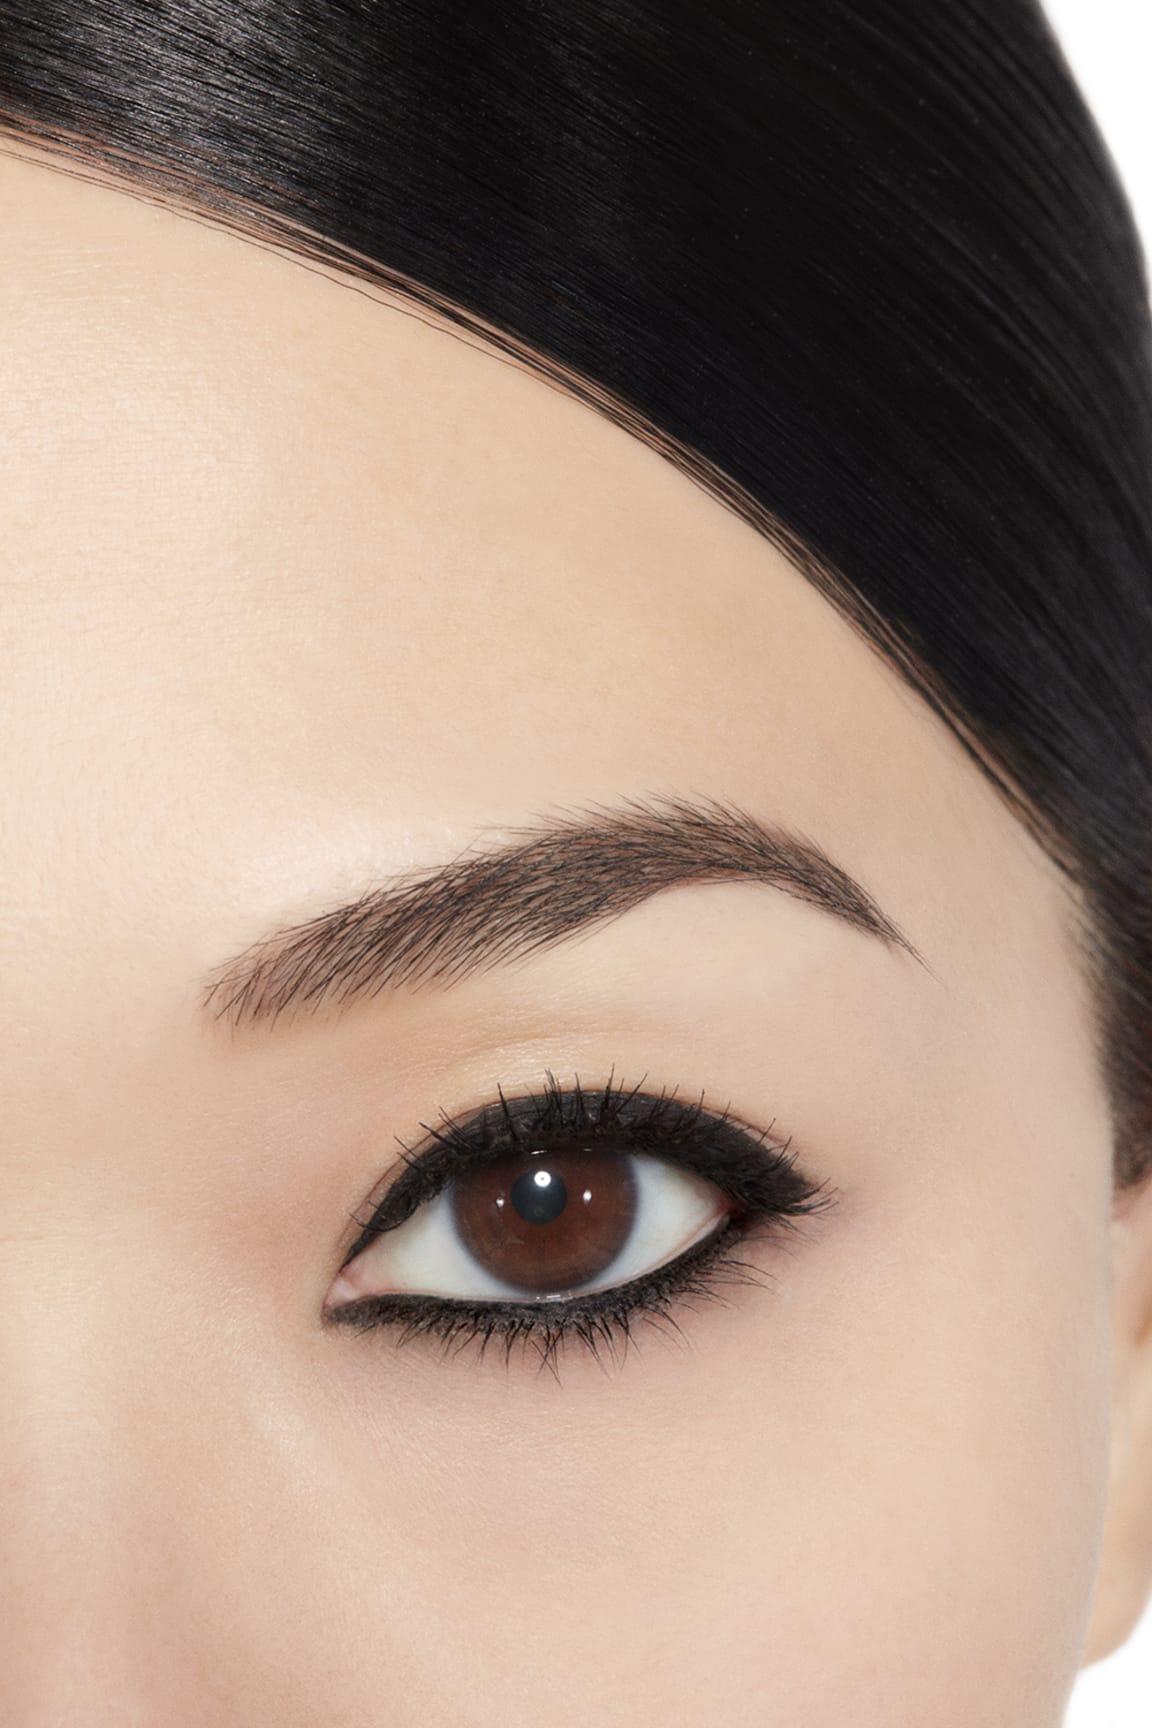 Application makeup visual 1 - STYLO YEUX WATERPROOF 88 - NOIR INTENSE